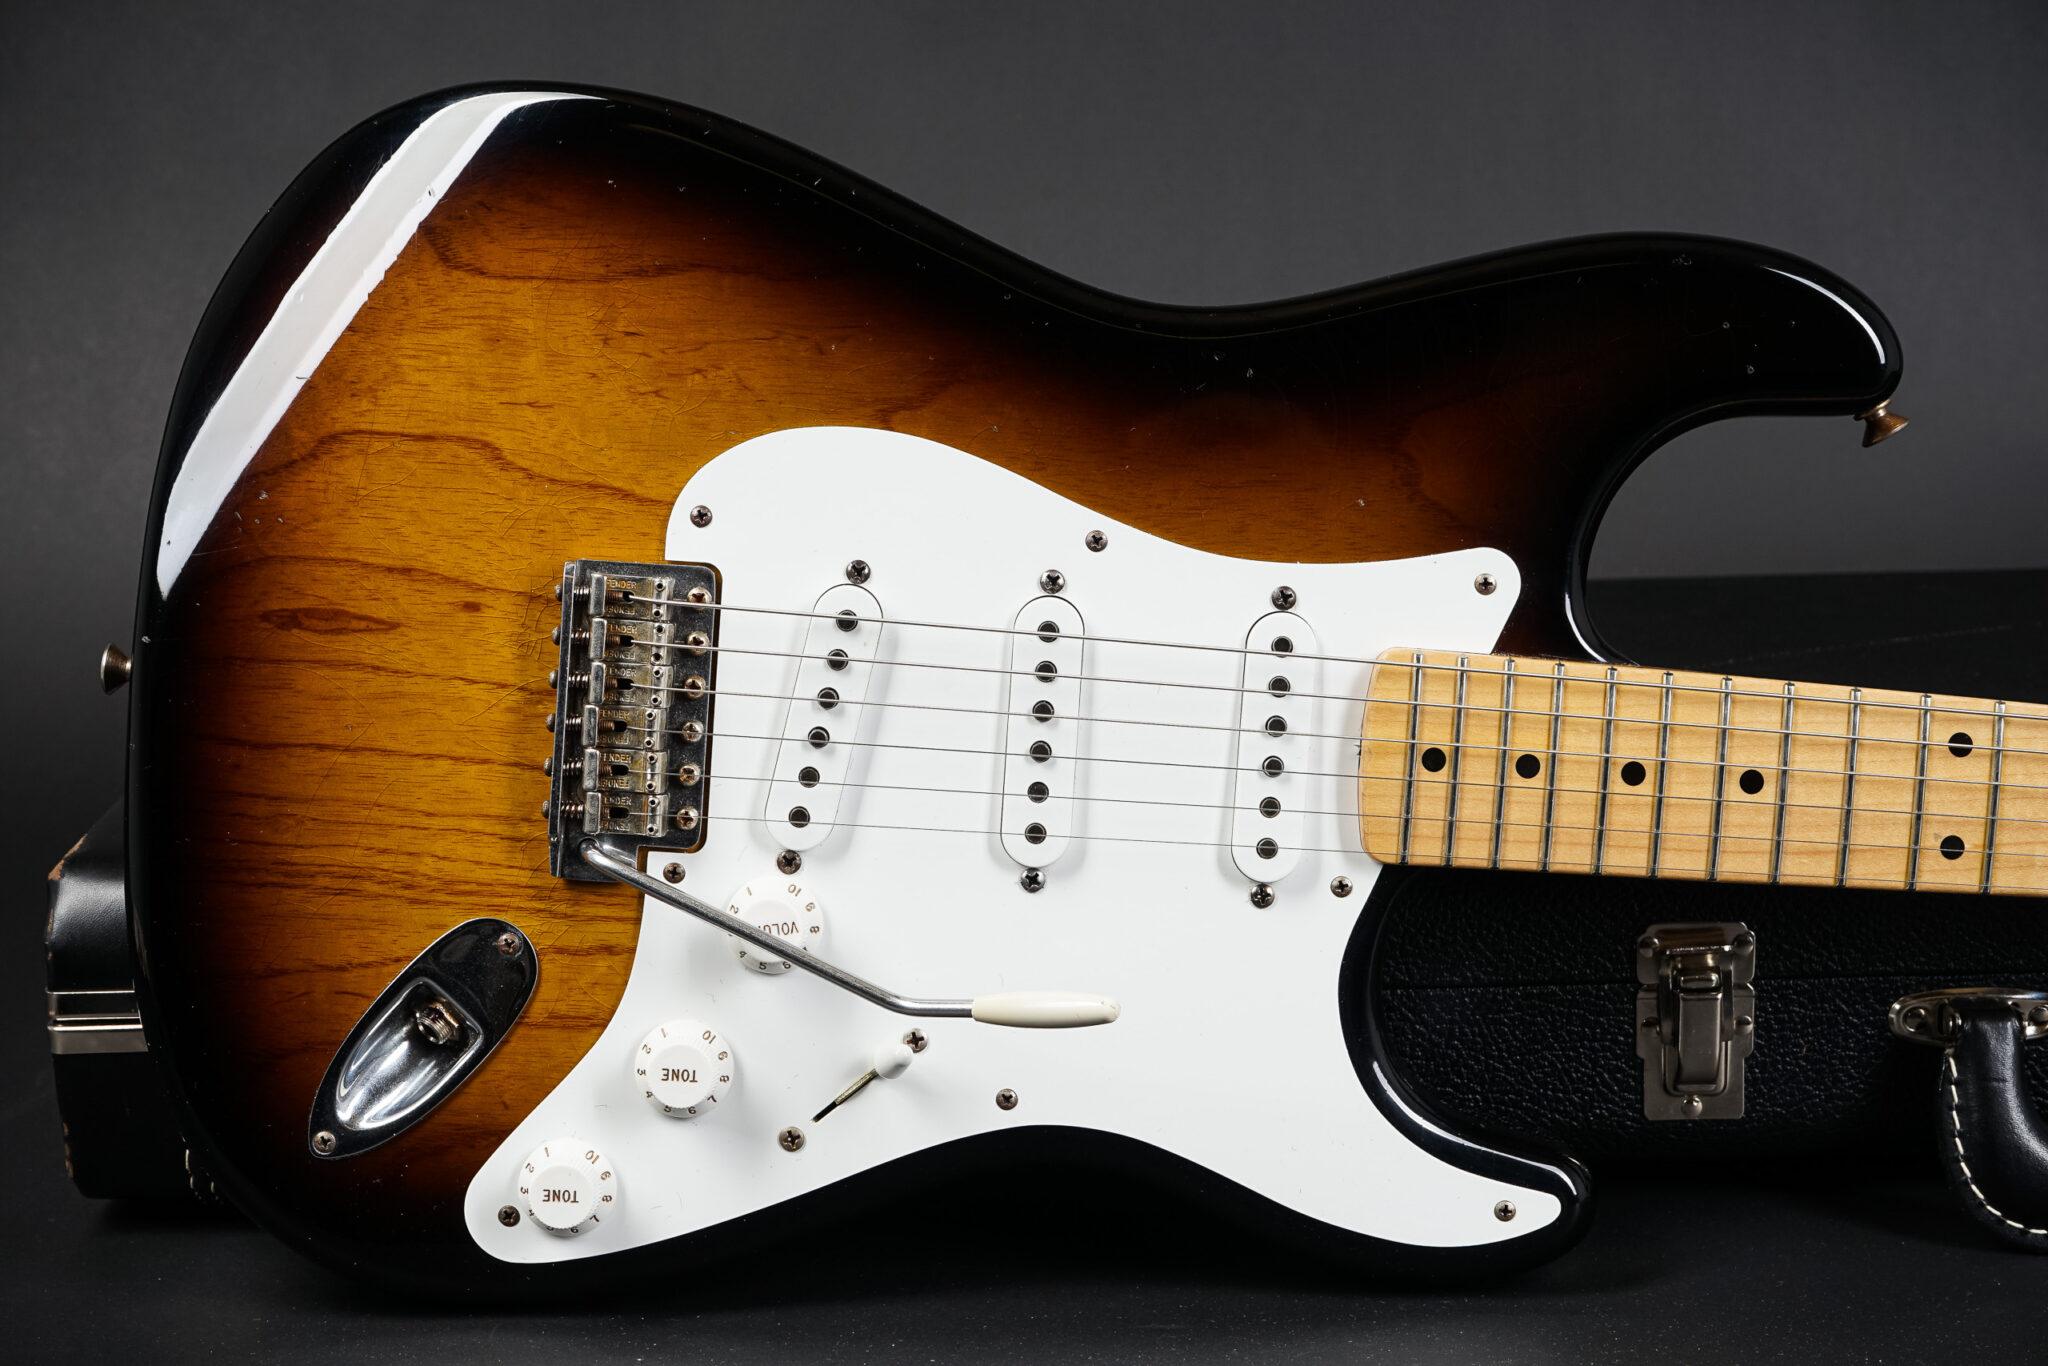 https://guitarpoint.de/app/uploads/products/2005-fender-greg-fessler-masterbuilt-1955-relic-stratocaster-sunburst/2005-Fender-1955-Stratocaster-Greg-Fessler-Stratocaster-R16954-9-2048x1366.jpg